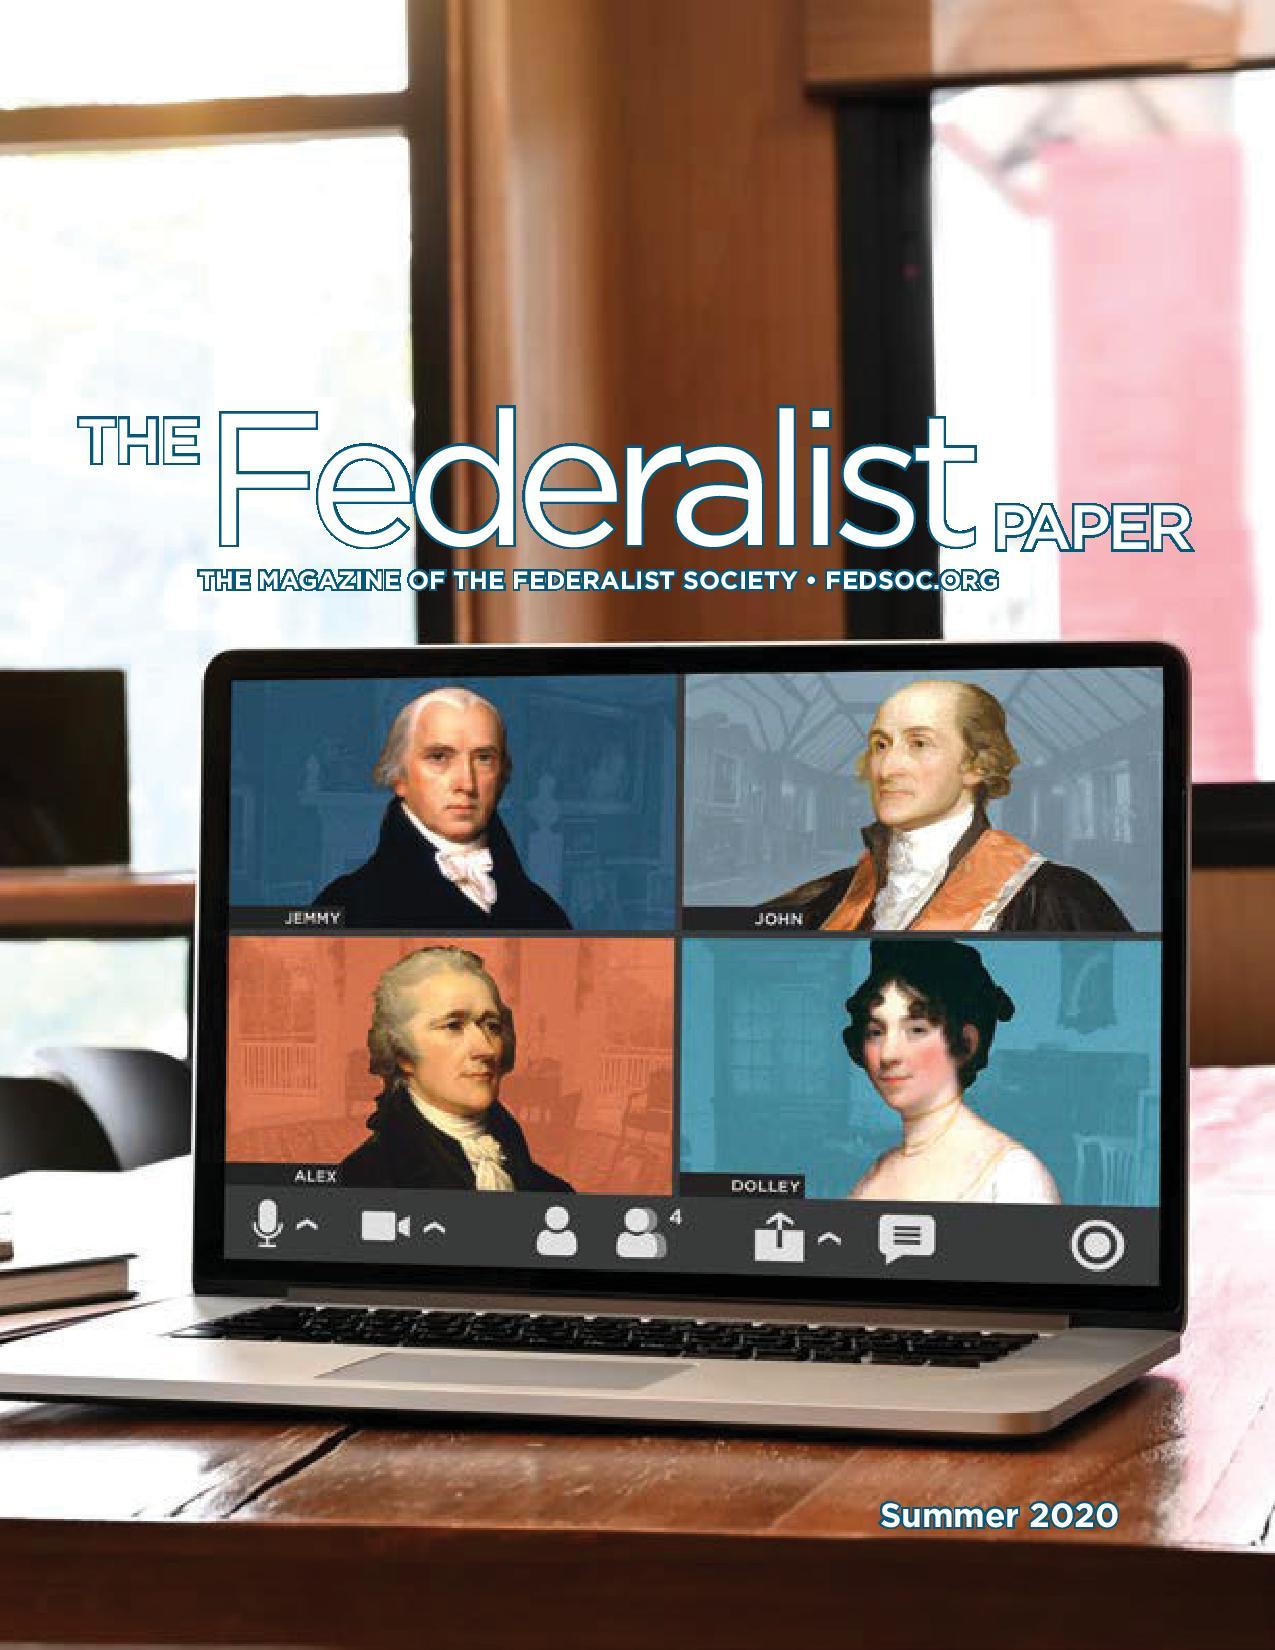 The Federalist Paper, Summer 2020